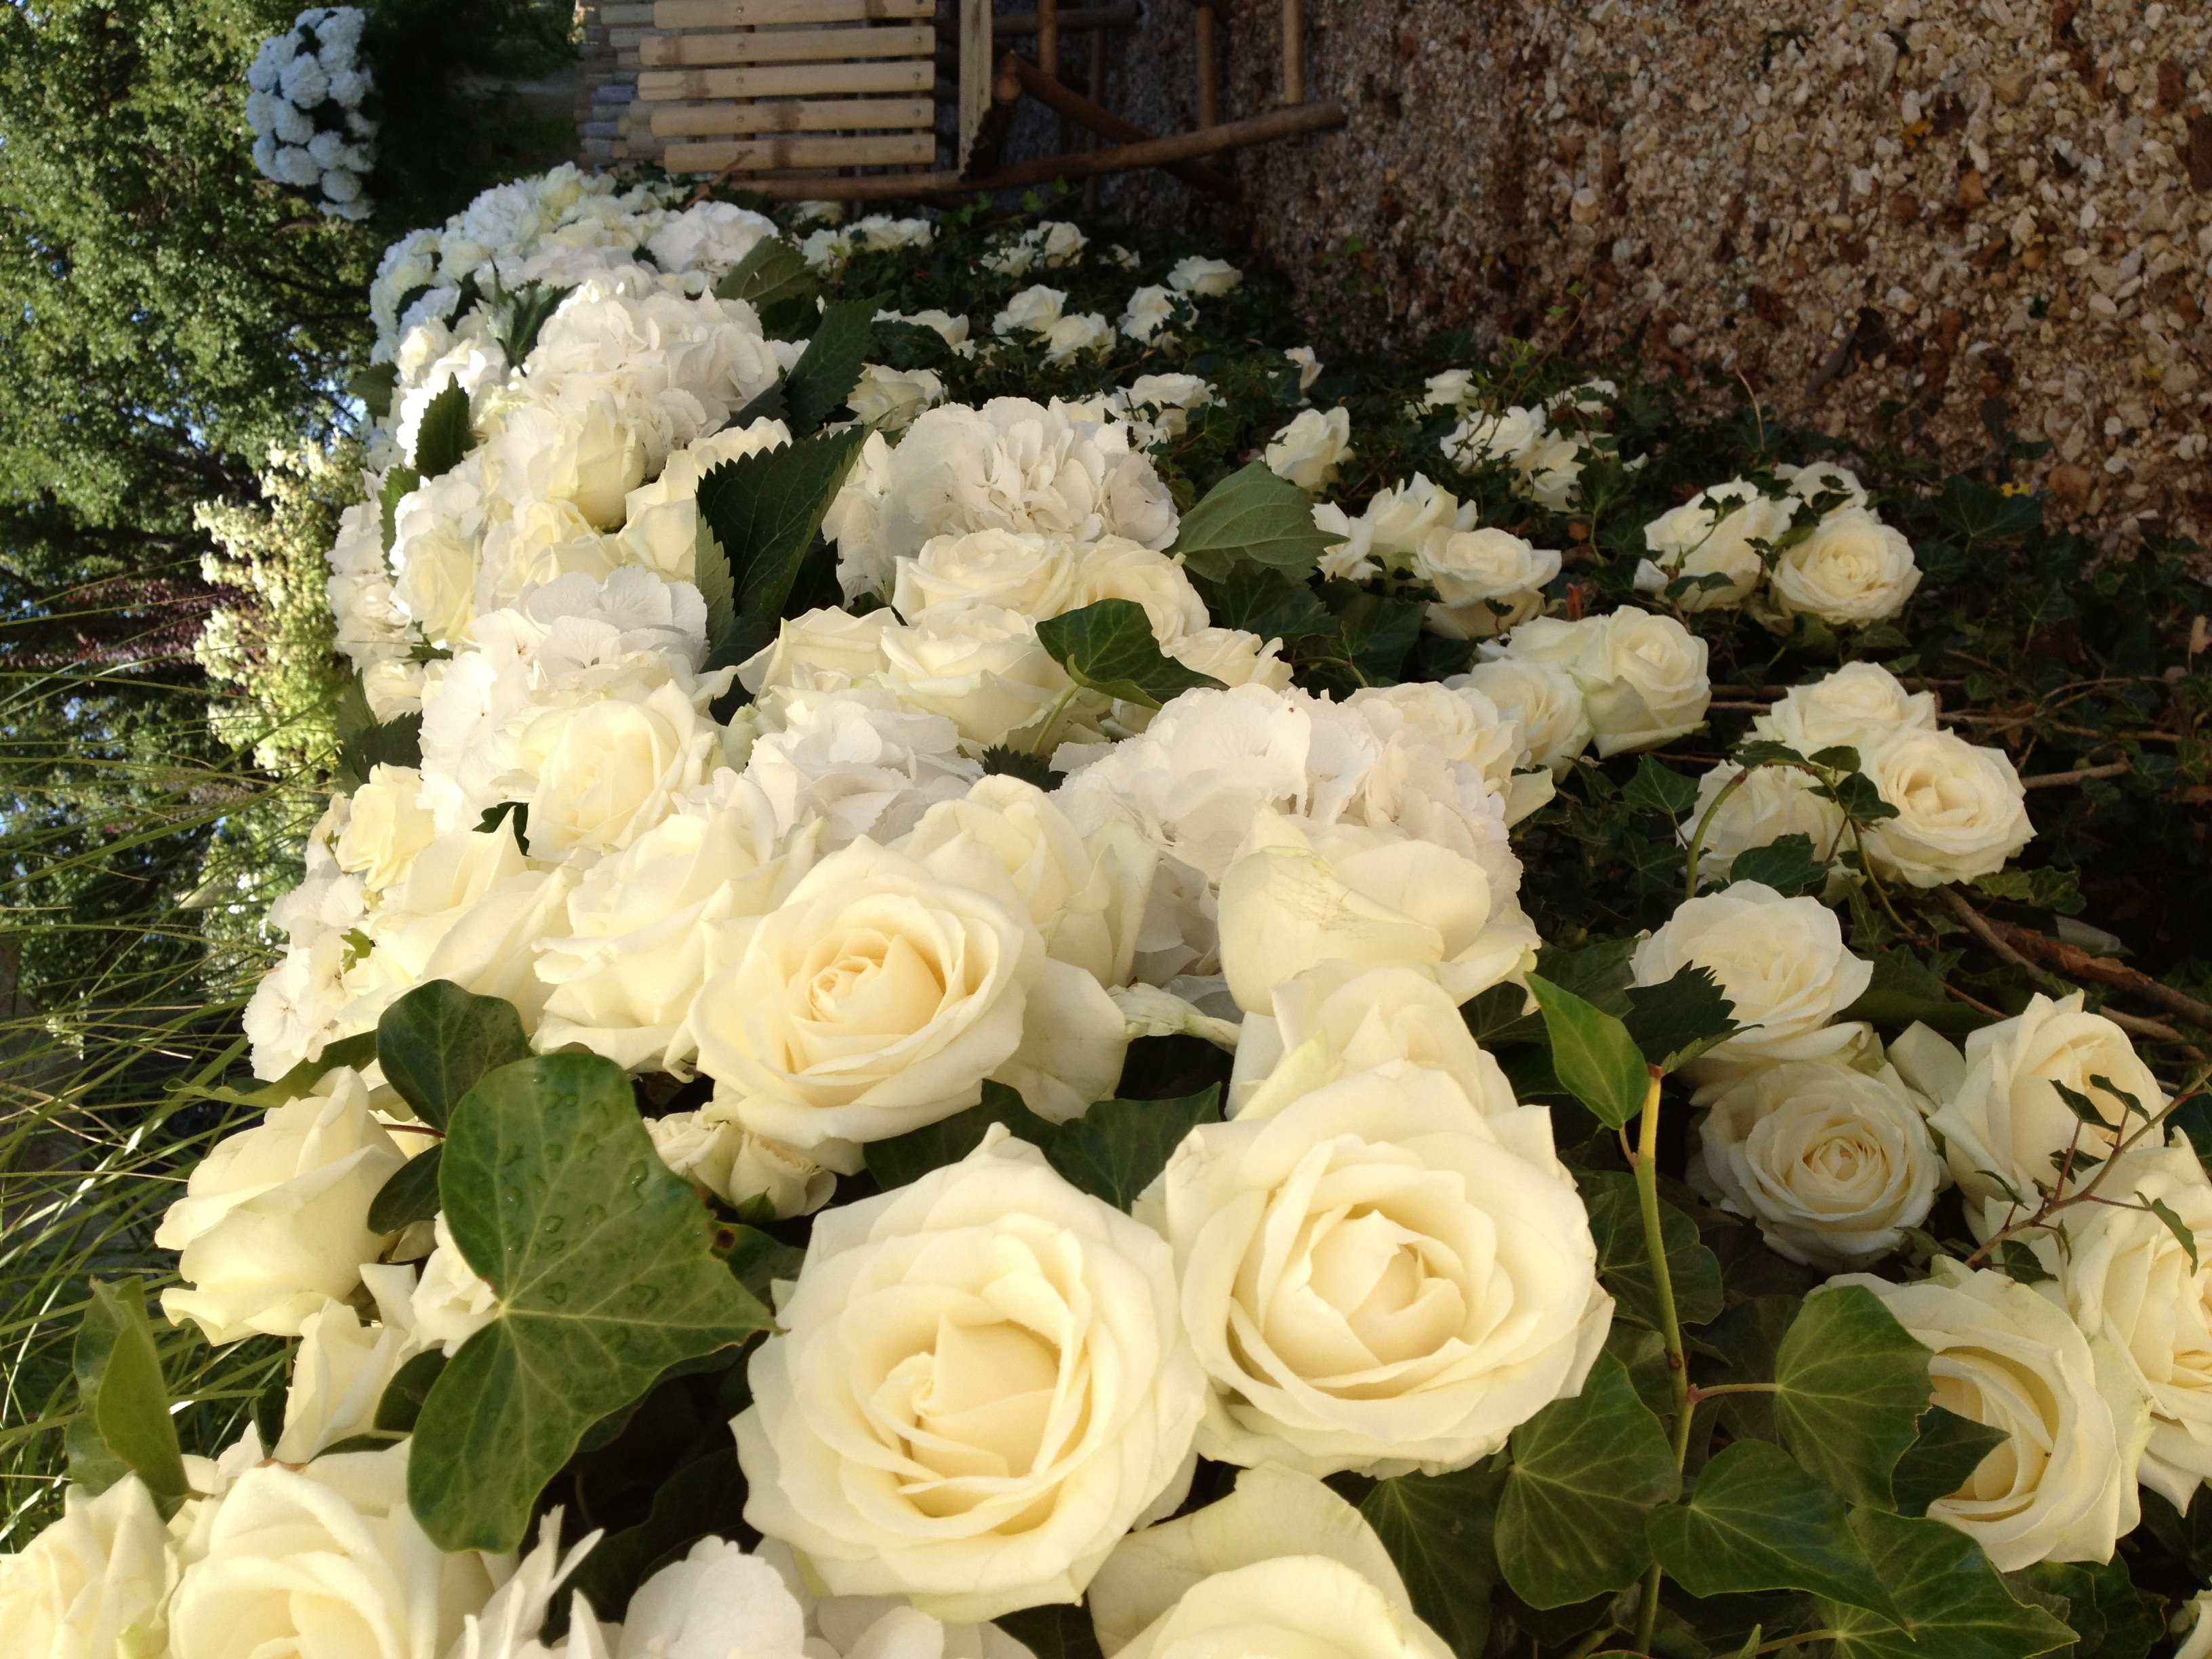 Décoration lieu de mariage roses Marlies Fleurs fleuriste Nimes